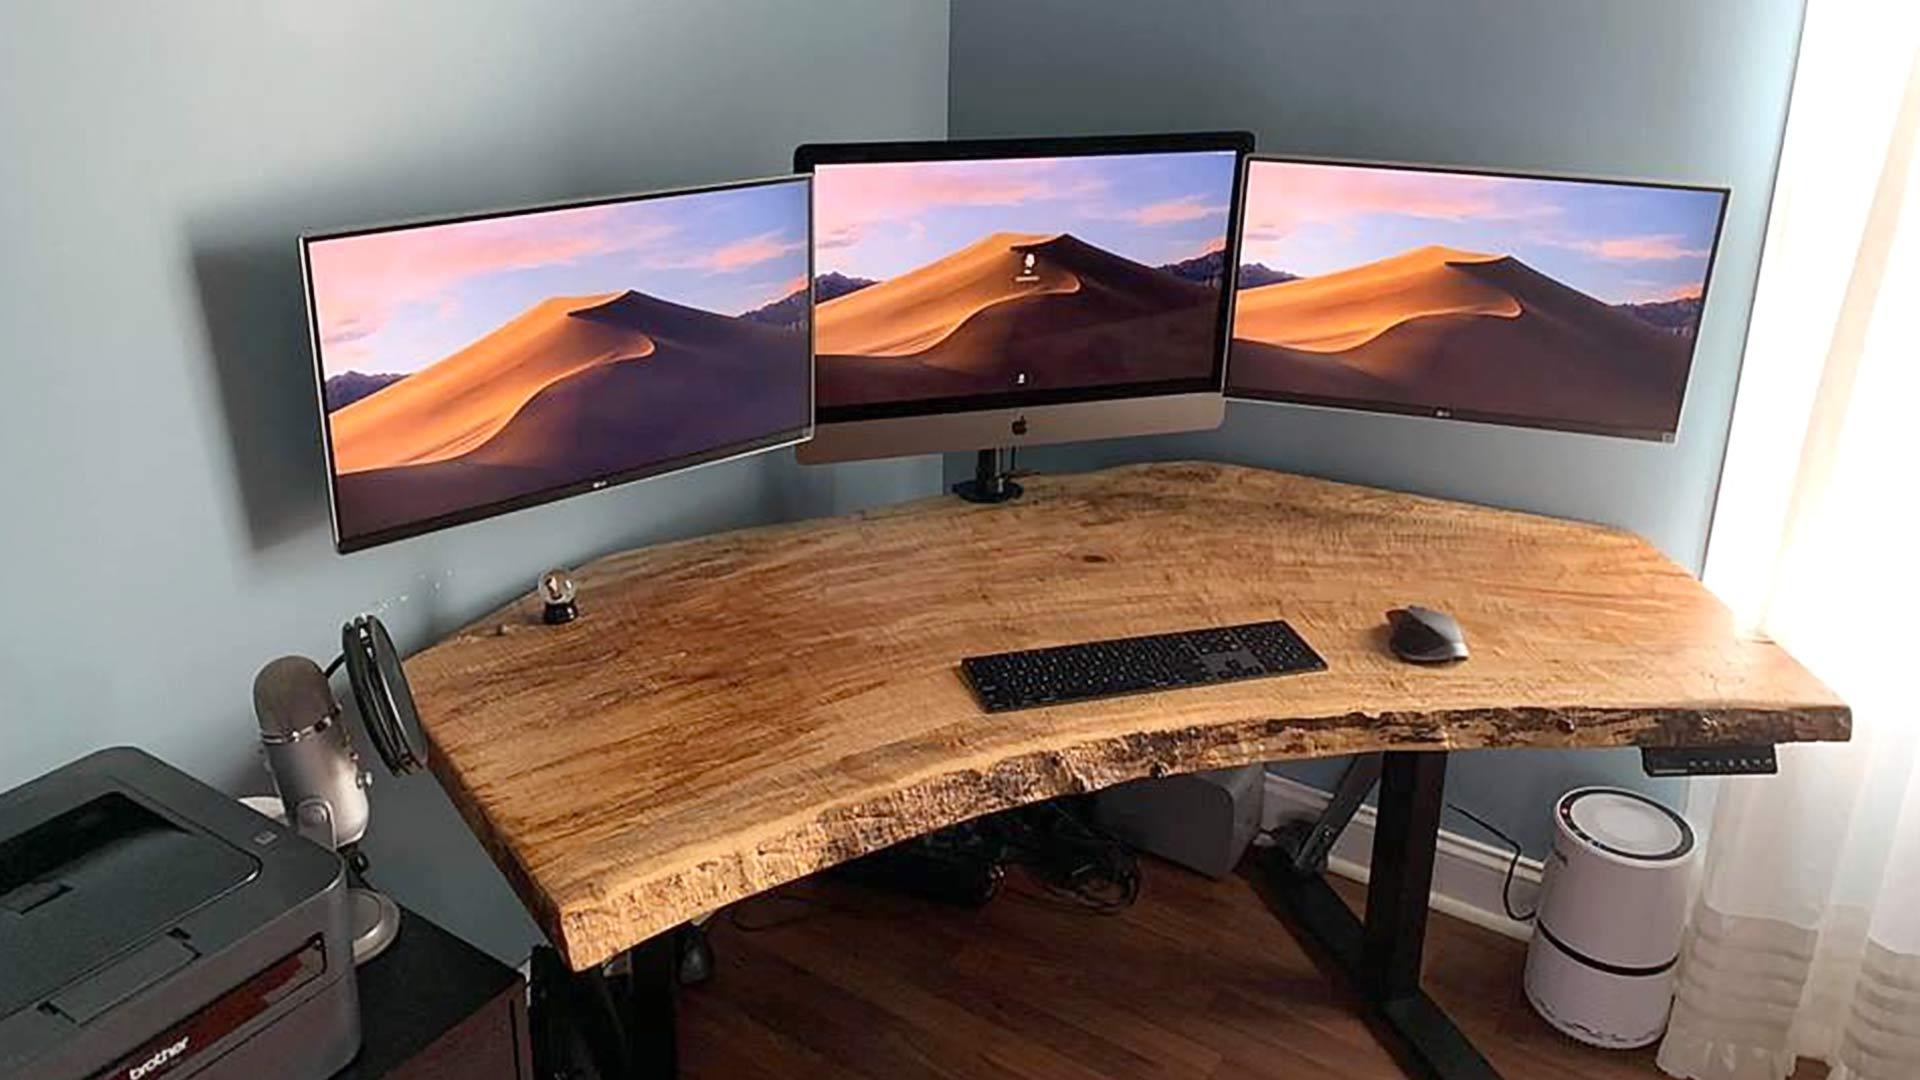 Beautiful custom desktop built on a SmartDesk DIY Kit standing desk frame.